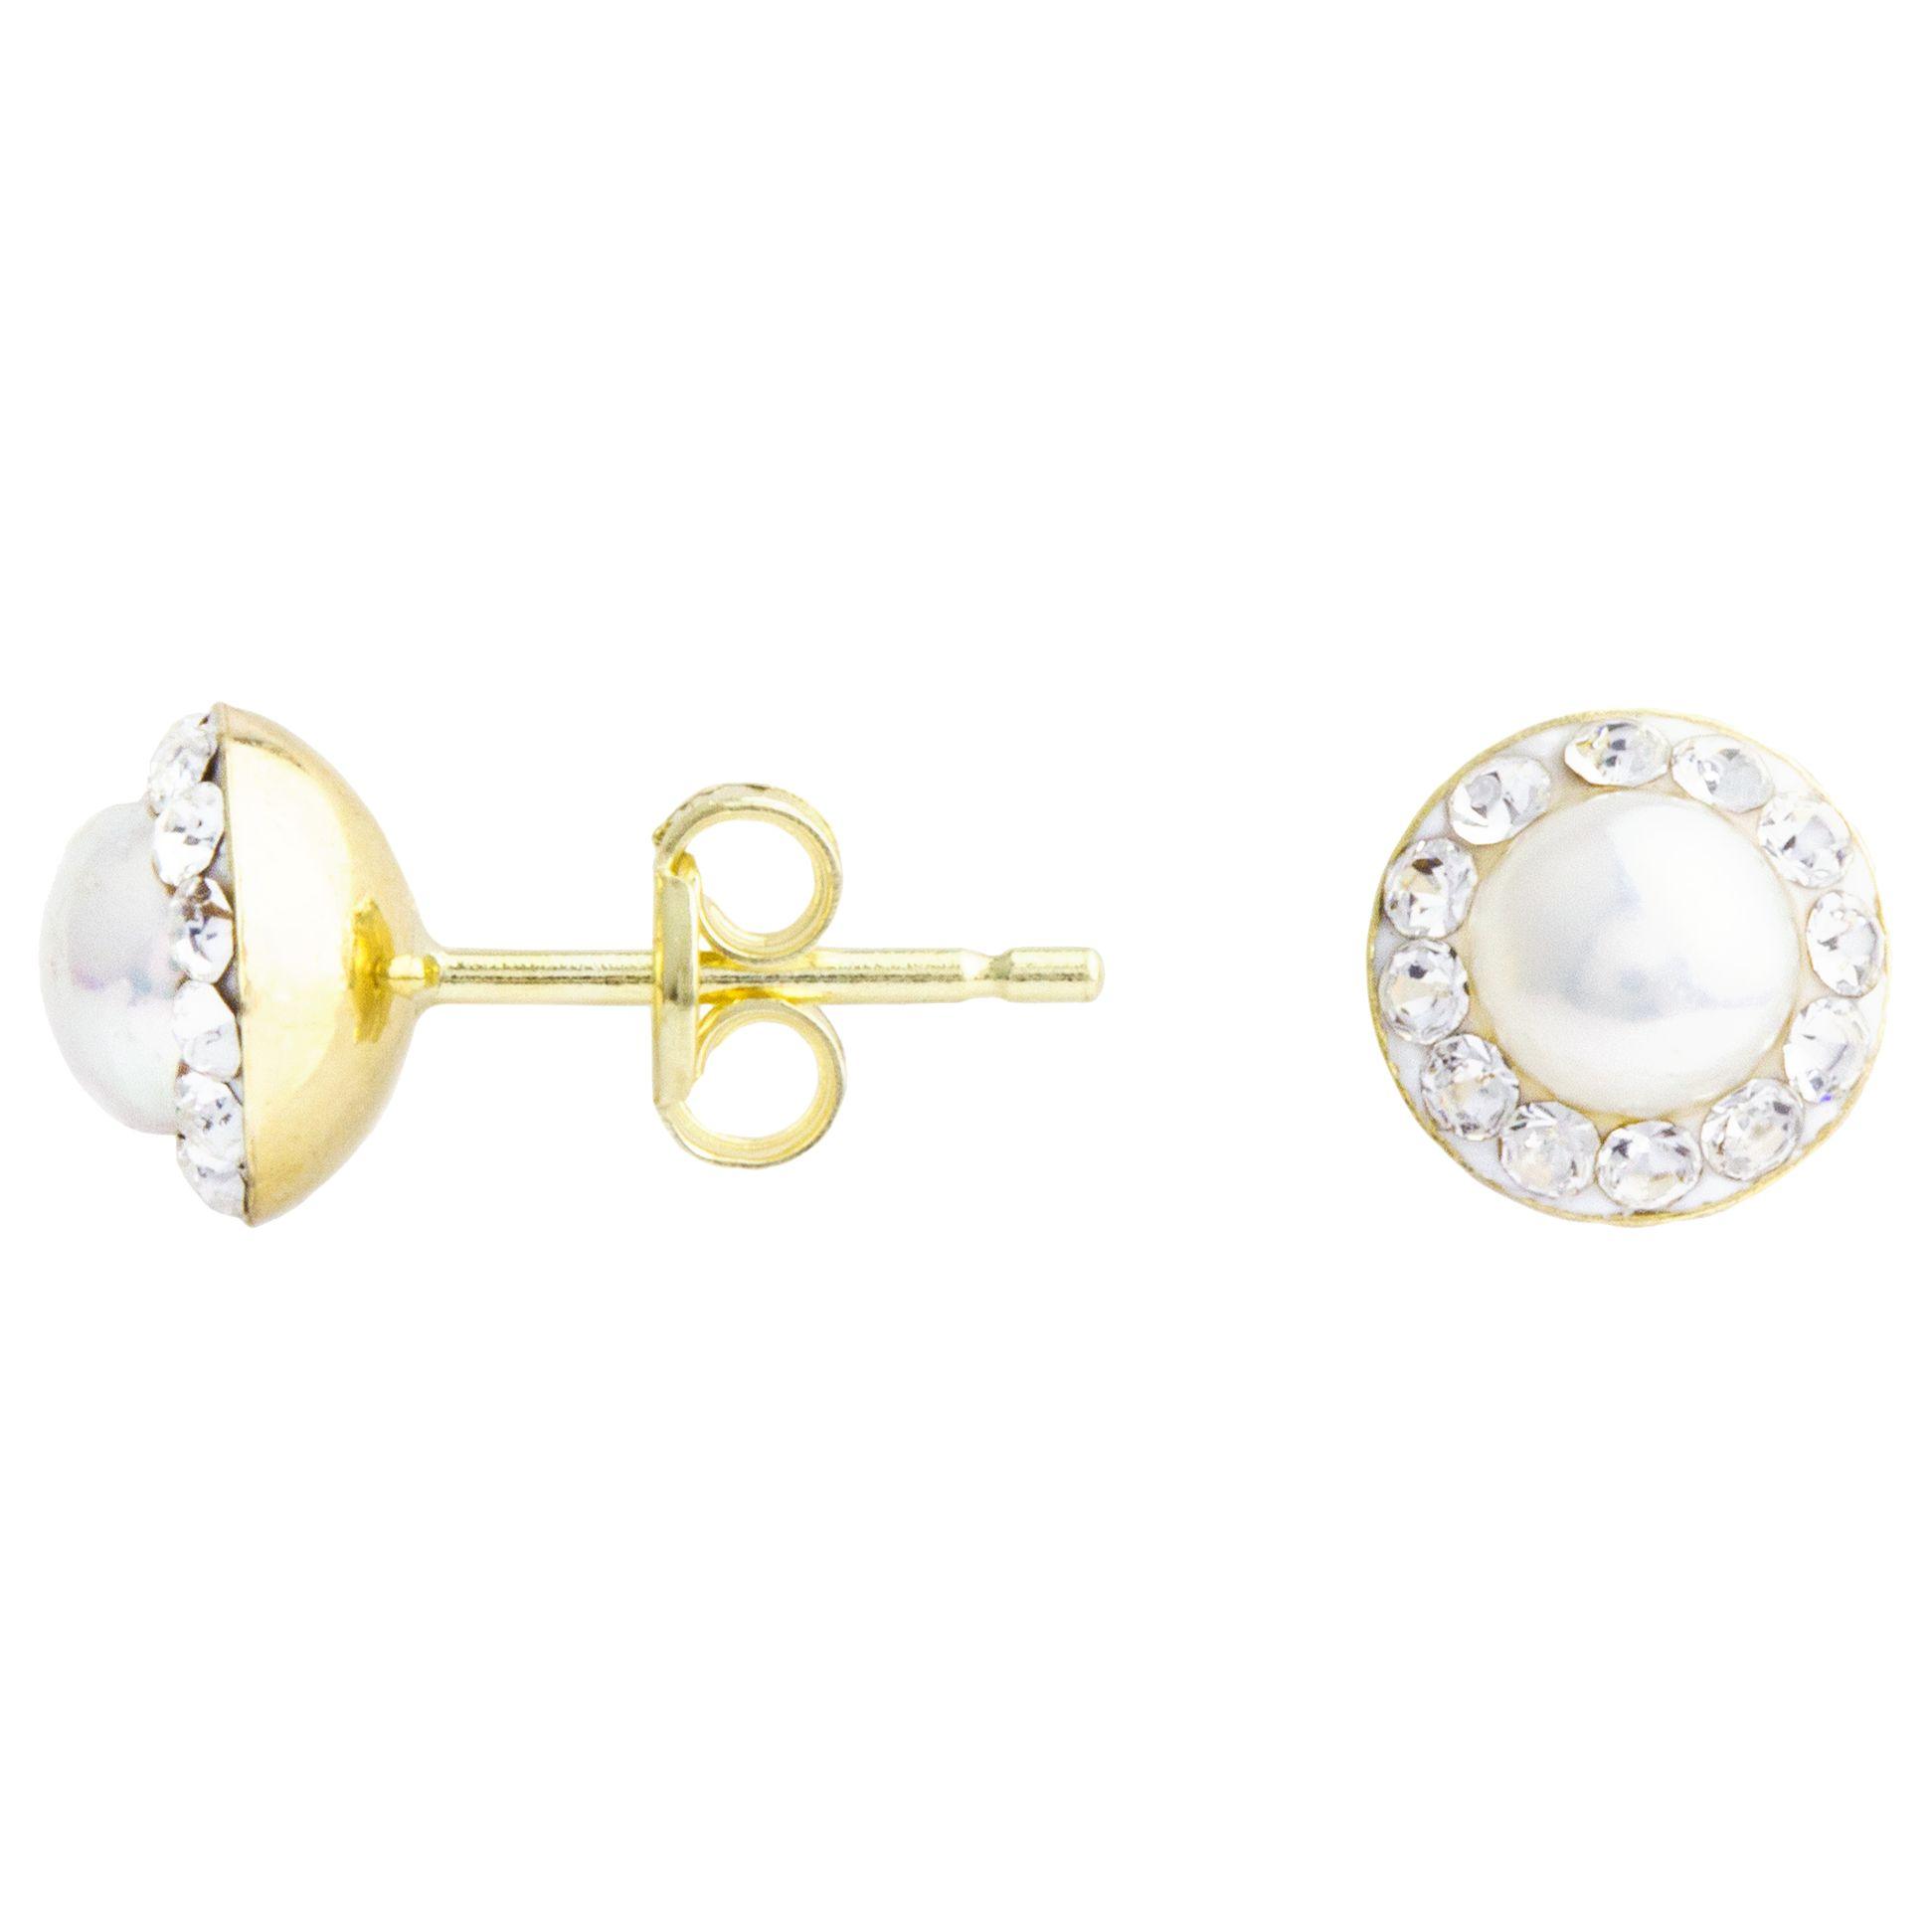 A B Davis A B Davis 9ct Yellow Gold Cubic Zirconia Surround Pearl Stud Earrings, White